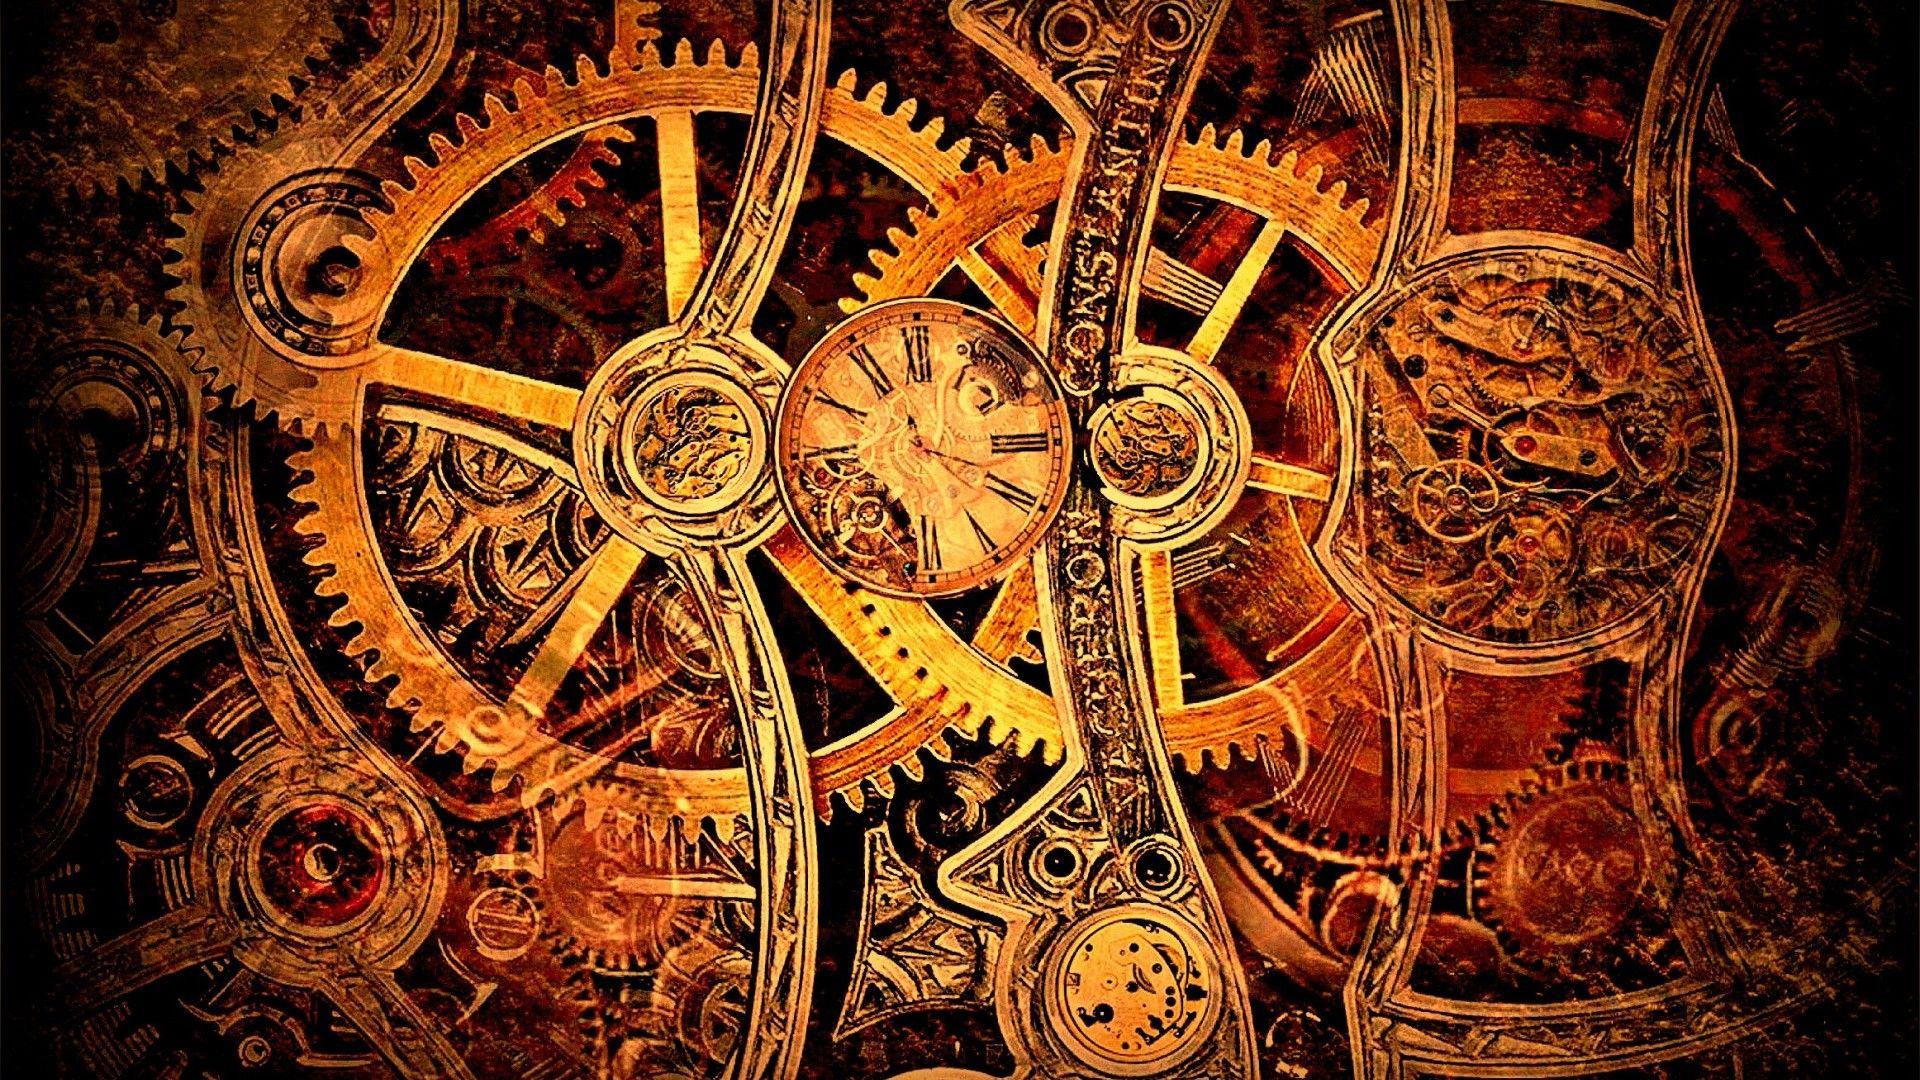 gears wallpaper clocks steampunk - photo #4